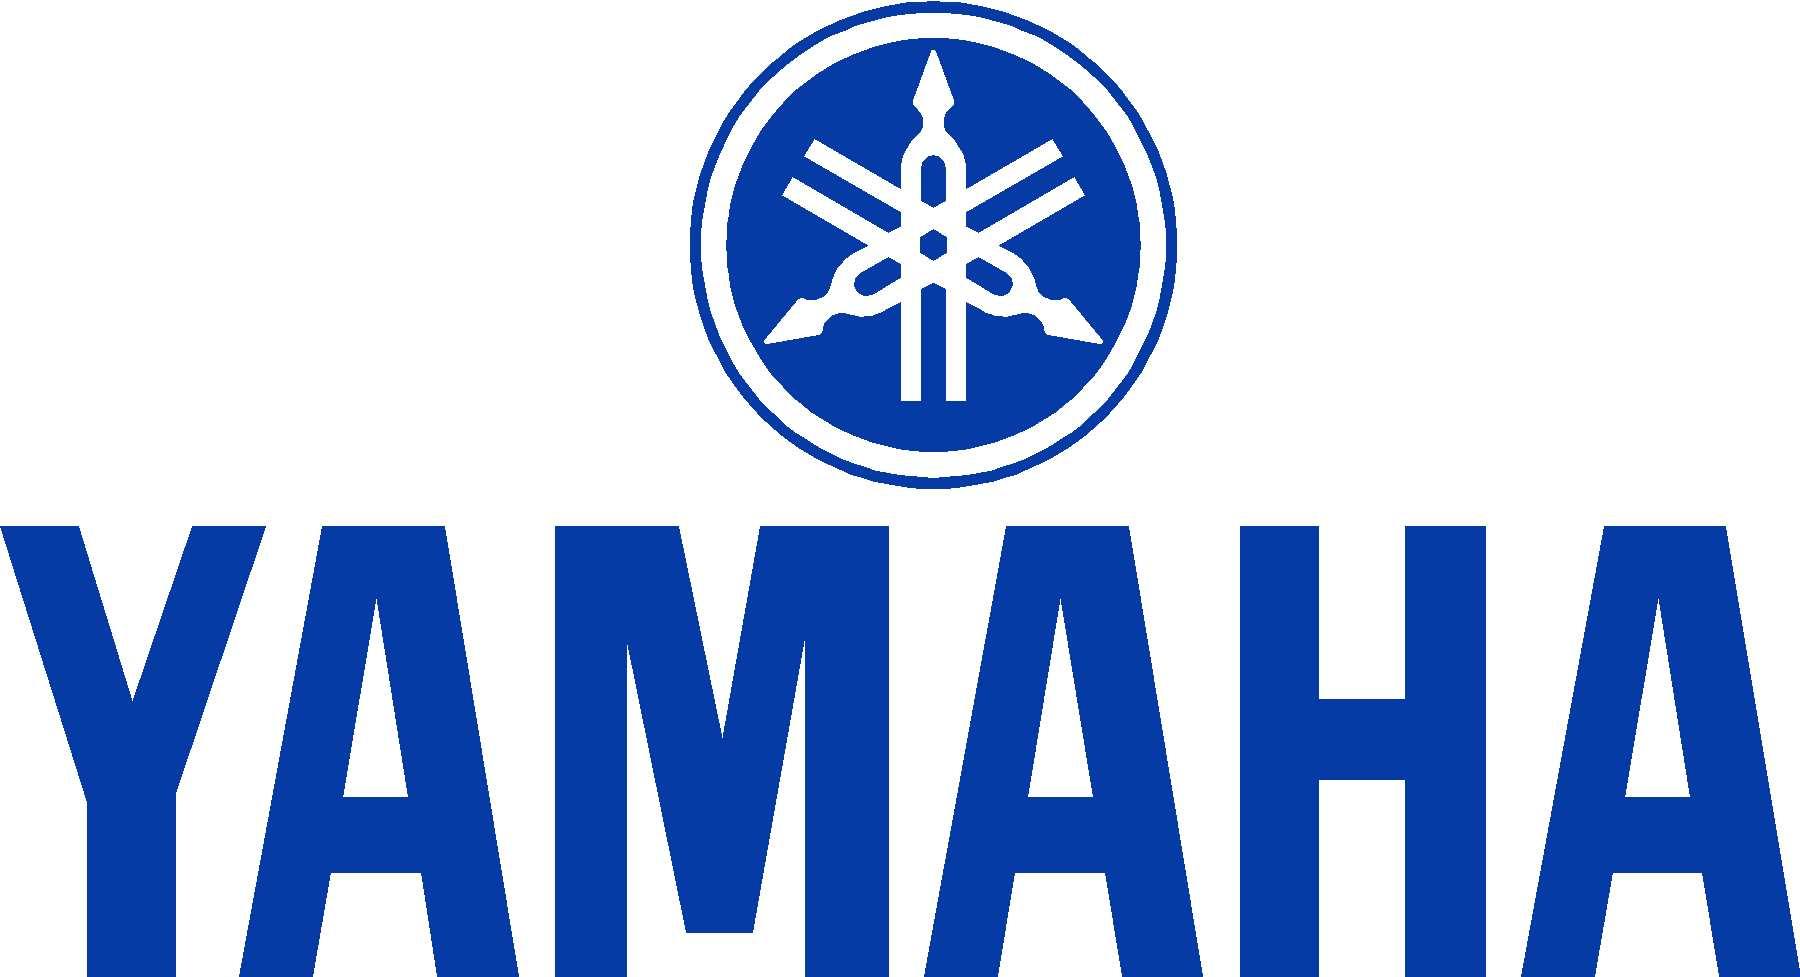 Yamaha Logo 7054 Hd Wallpapers in Logos   Imagesci 1800x977